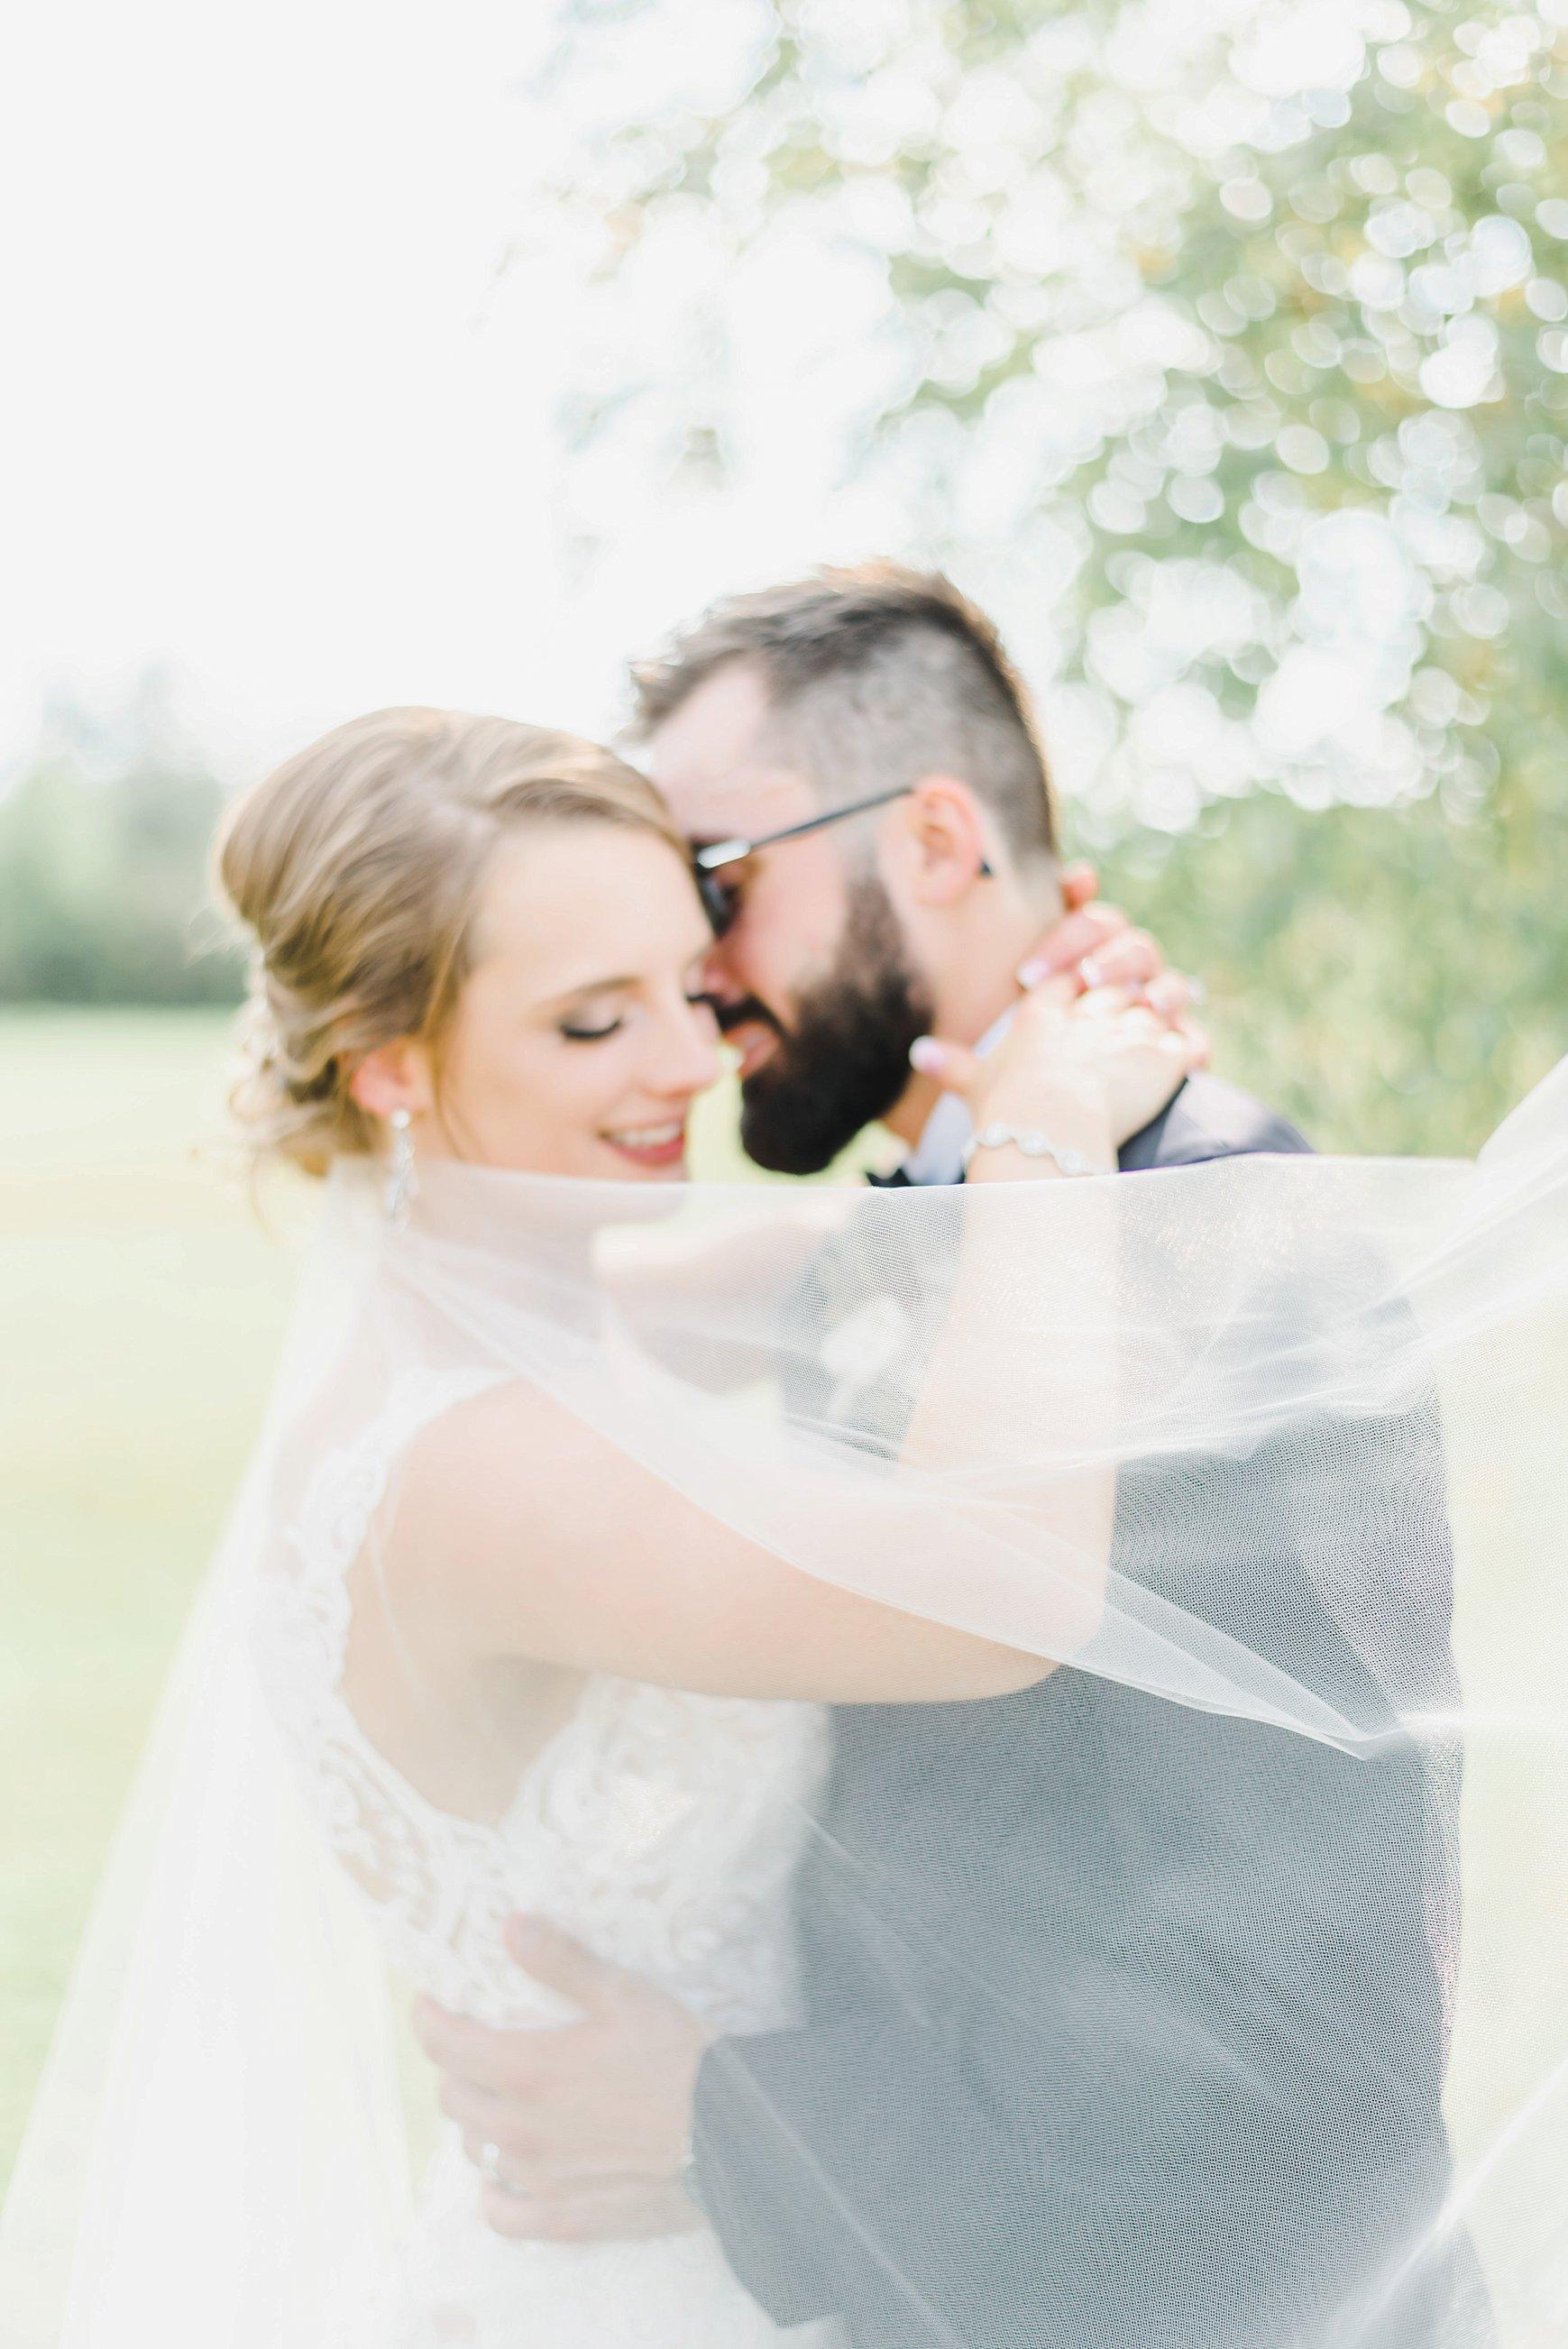 light airy indie fine art ottawa wedding photographer | Ali and Batoul Photography_1317.jpg